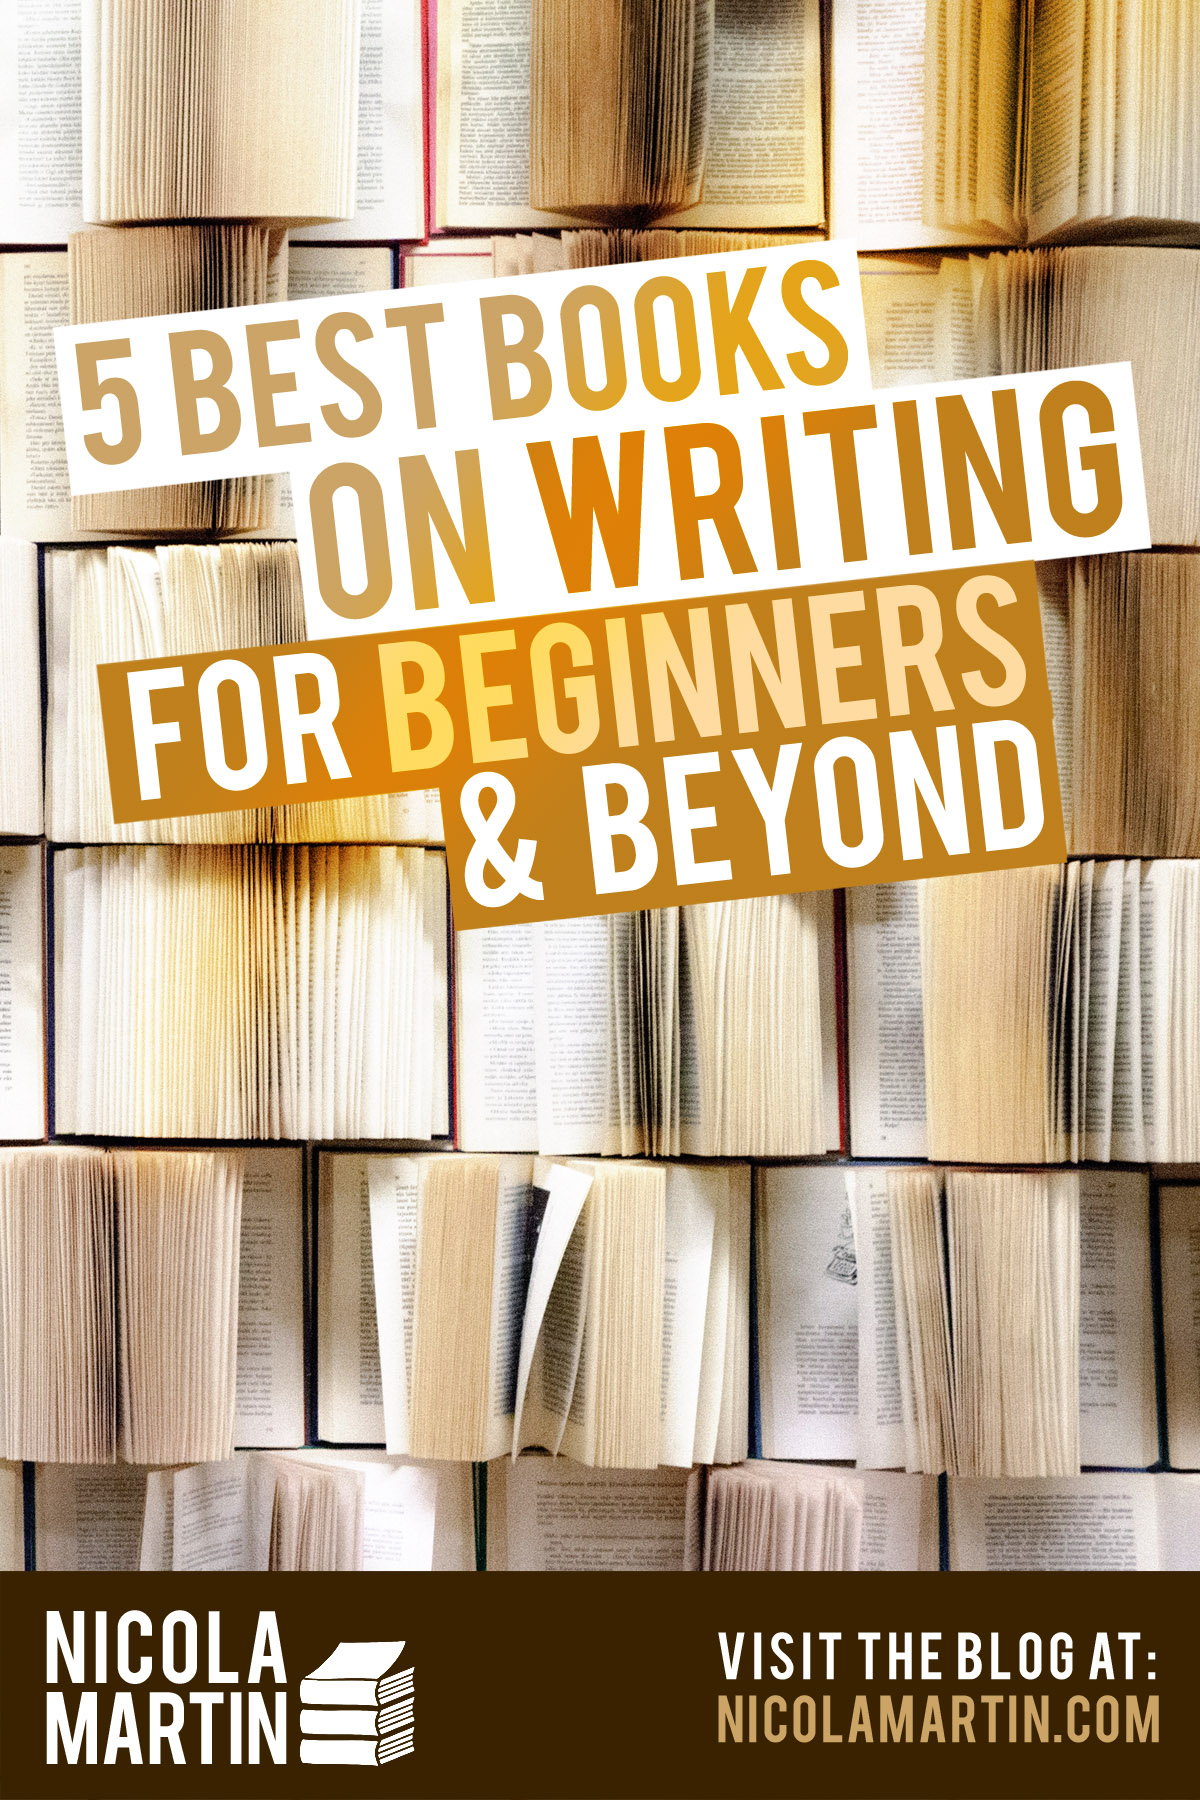 5 best books on writing